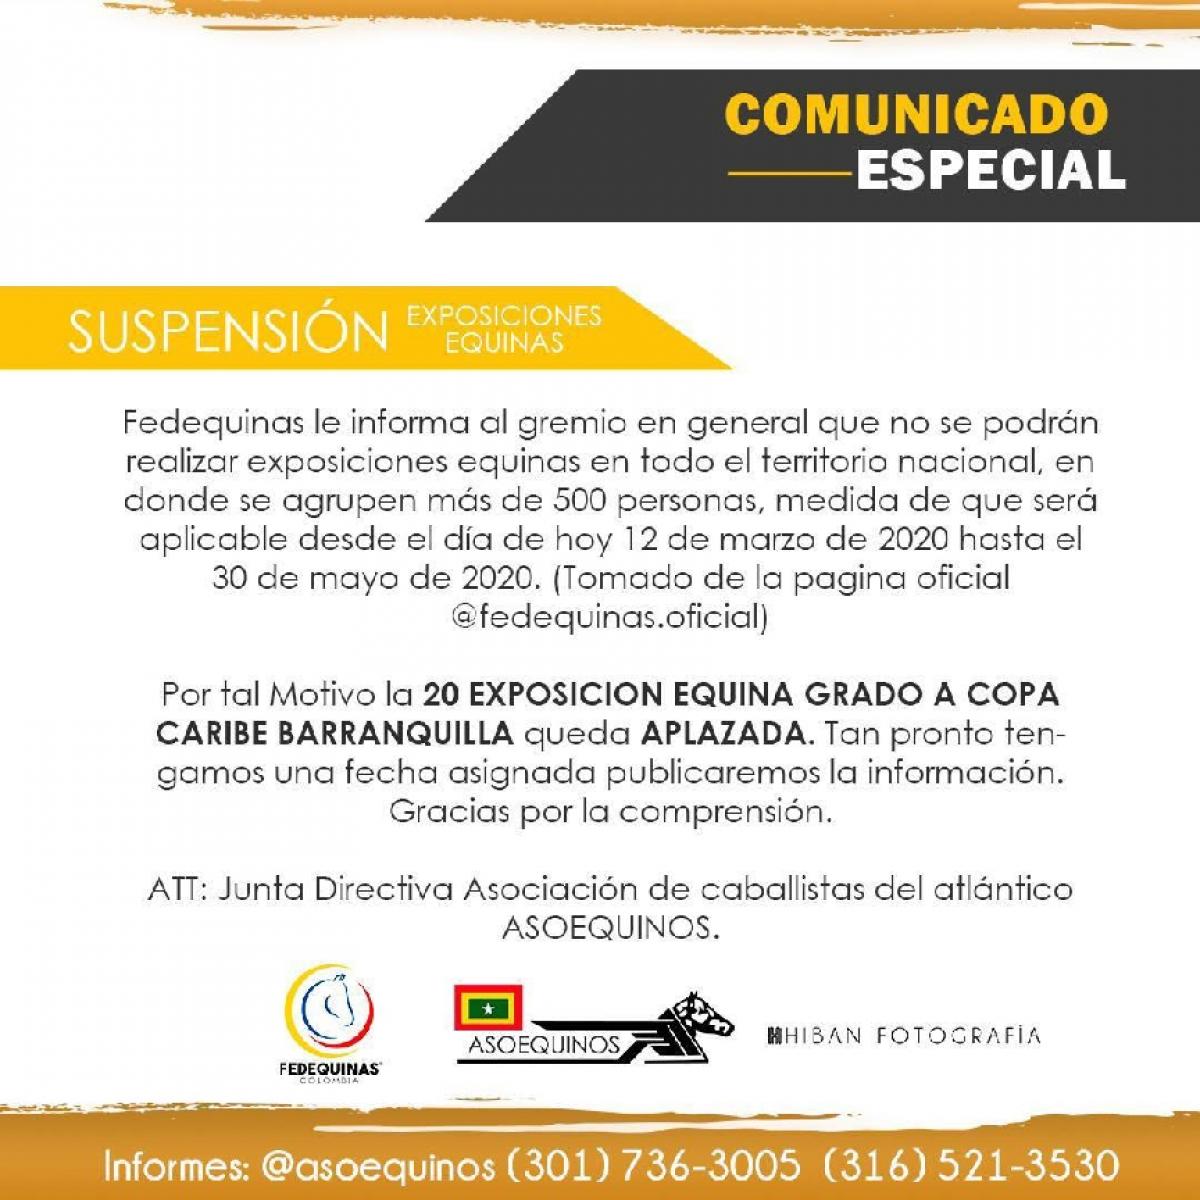 20 Copa Caribe Barranquilla -  APLAZADA